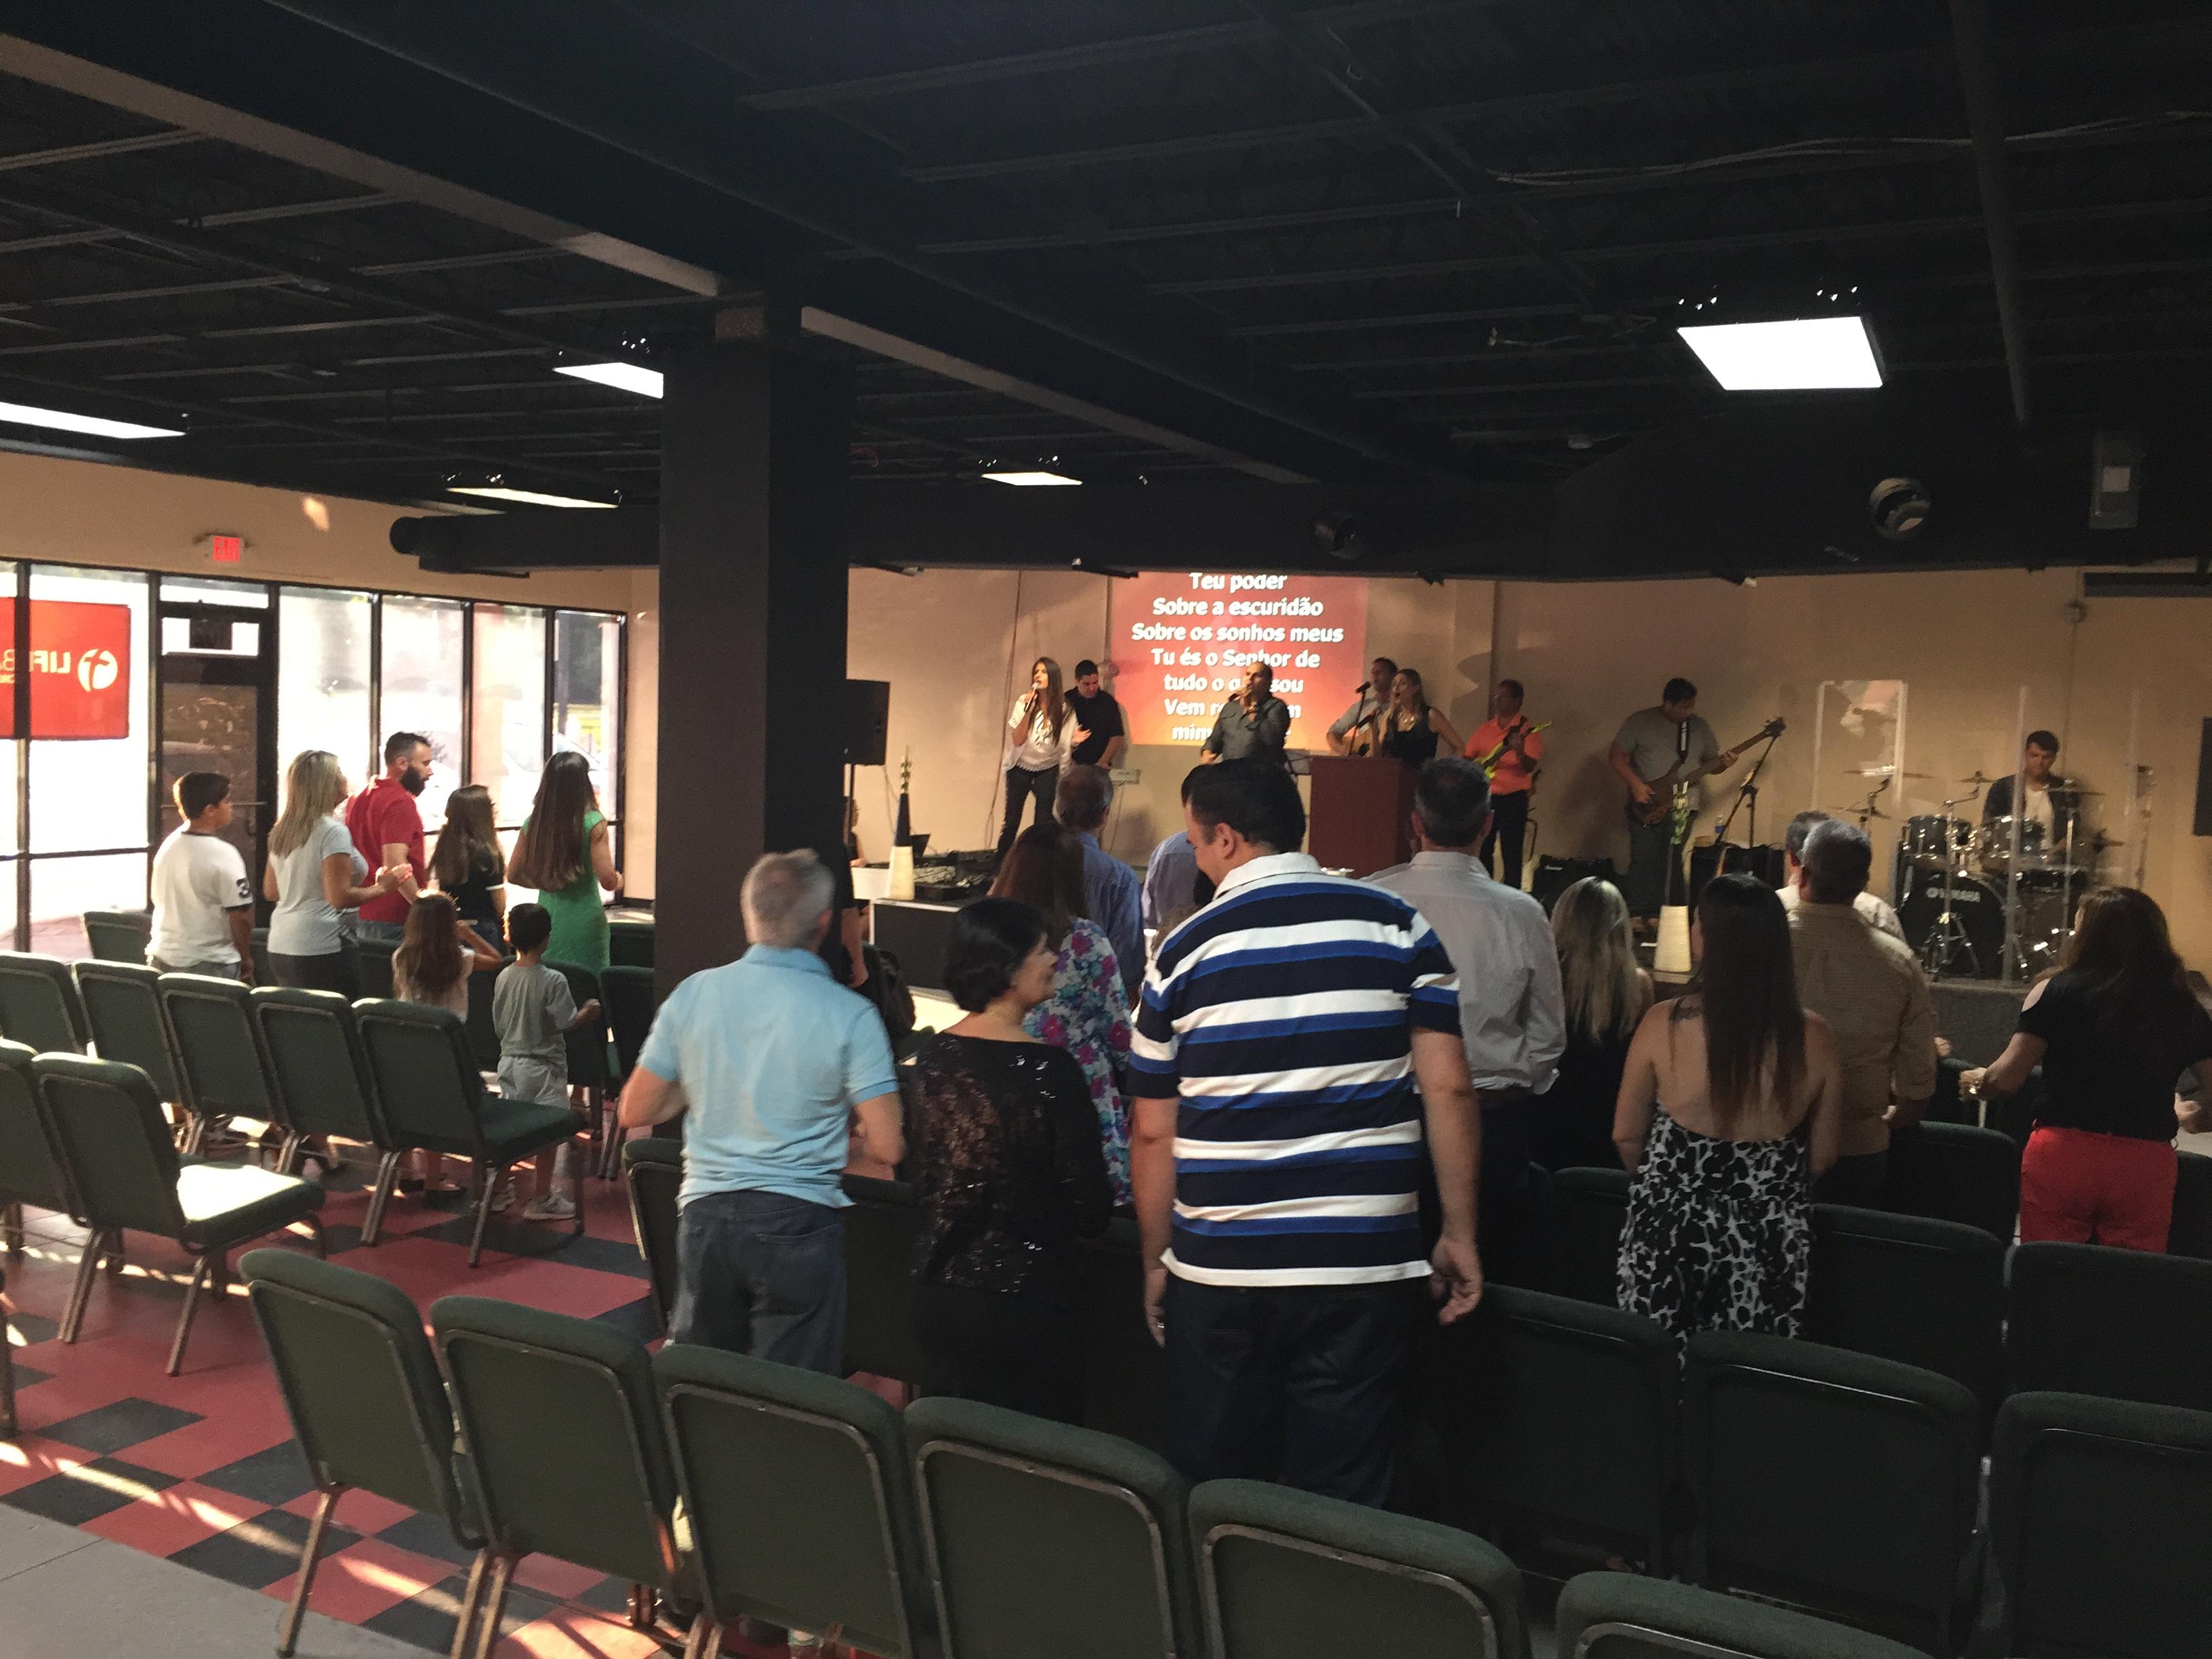 Life Baptist